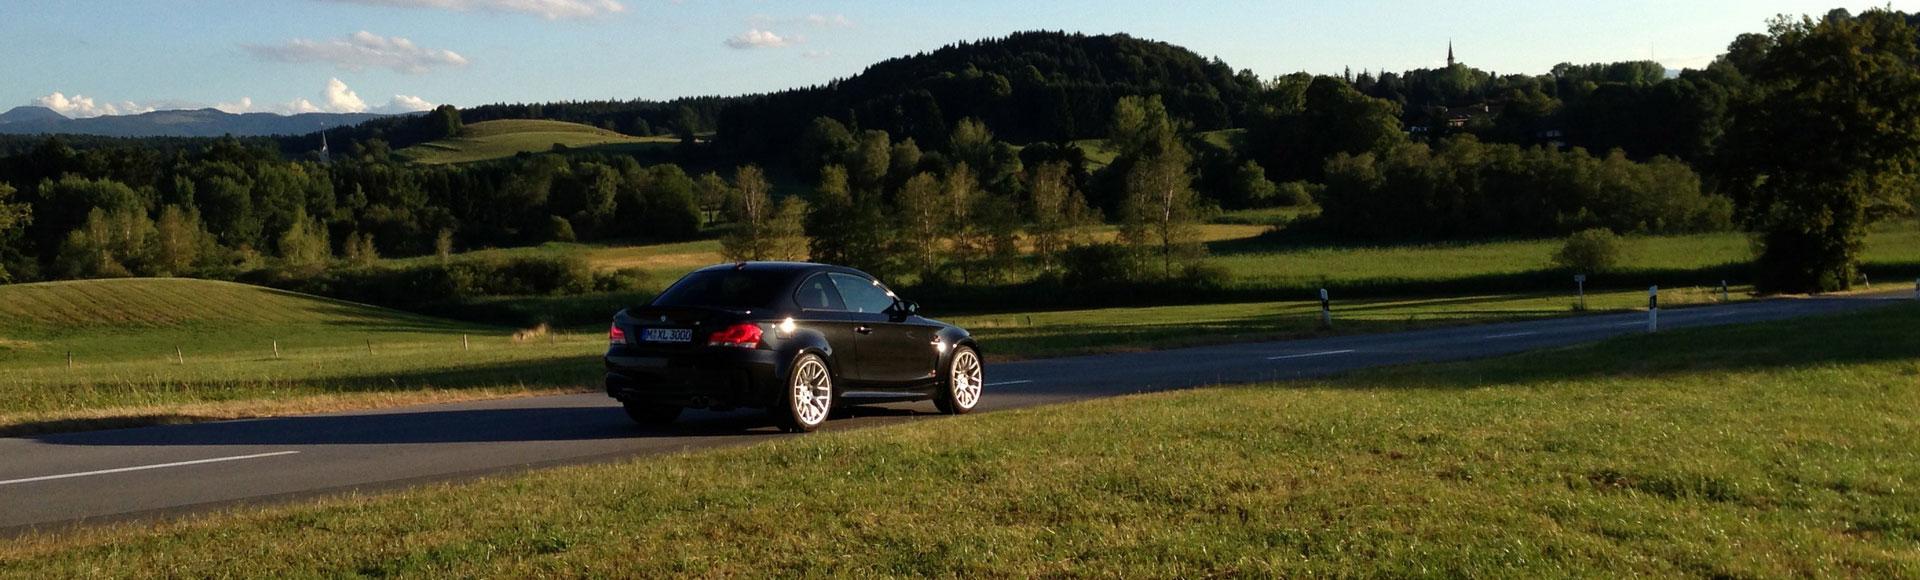 BMW 1er 2012 M Coupe Sommer 055